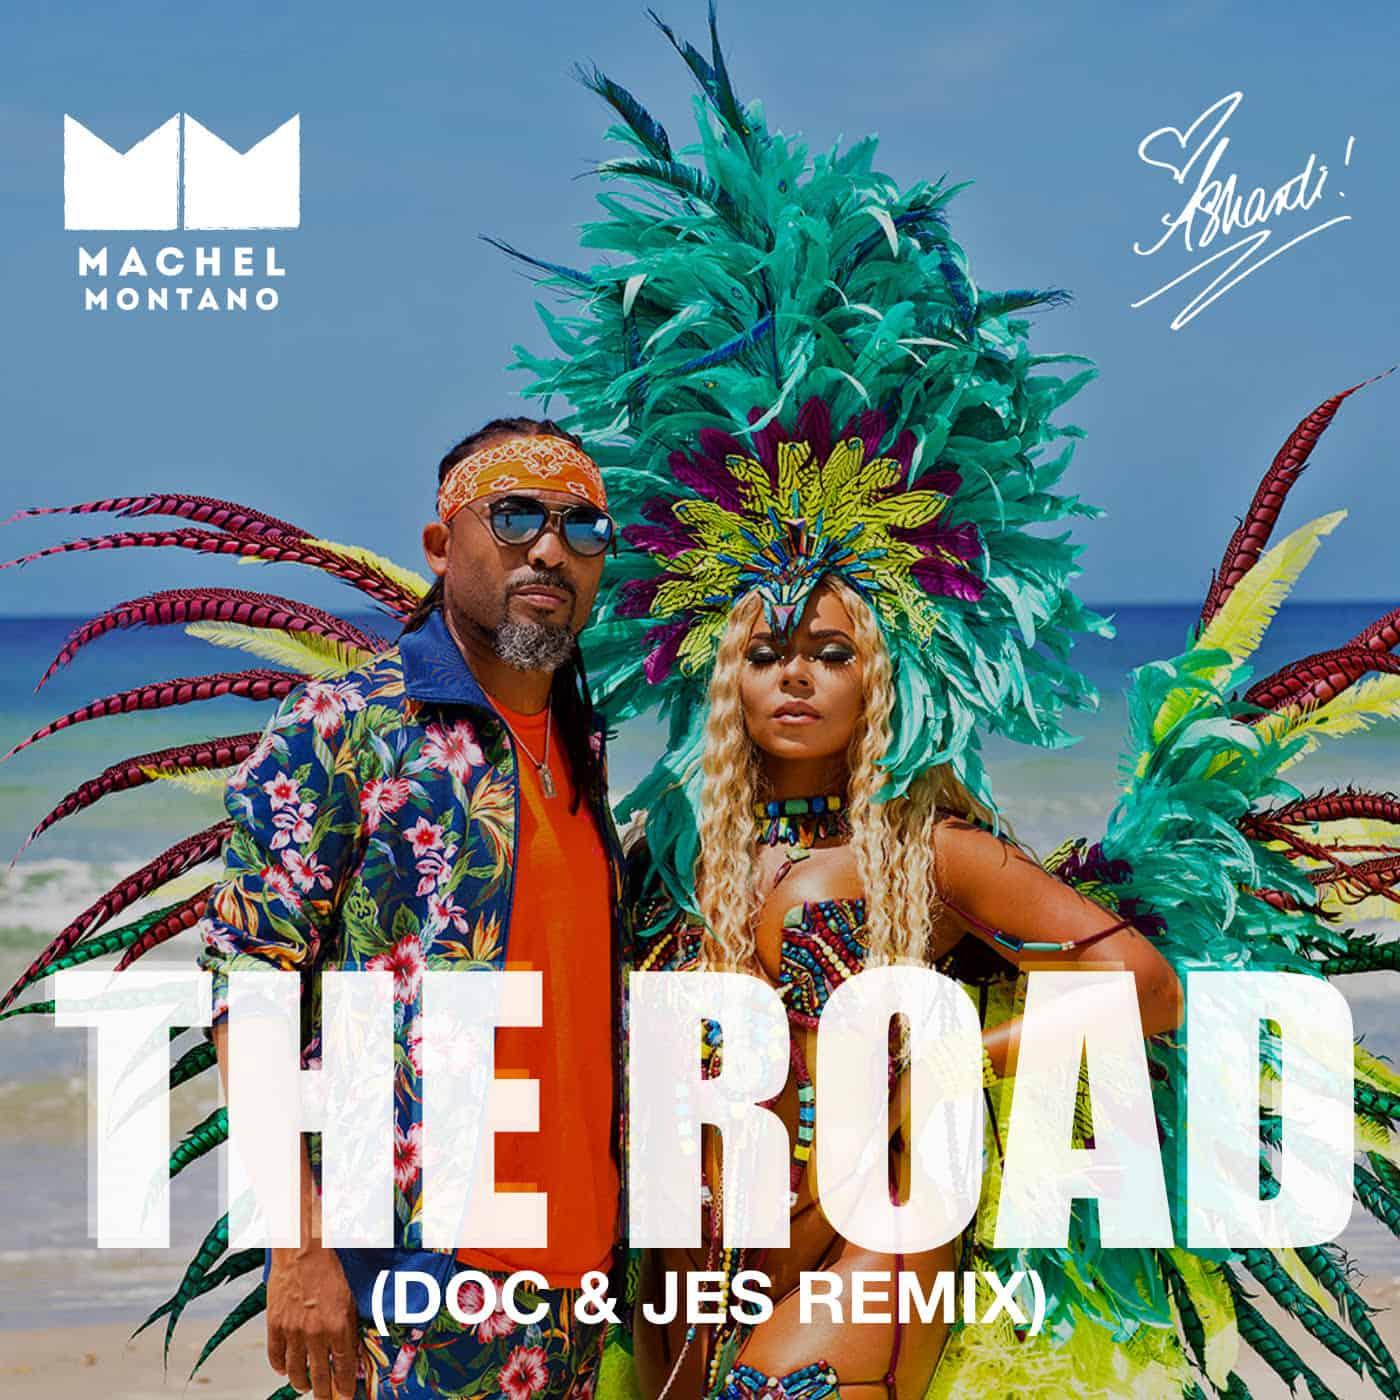 Machel Montano & Ashanti - The Road (Doc & Jes Remix)